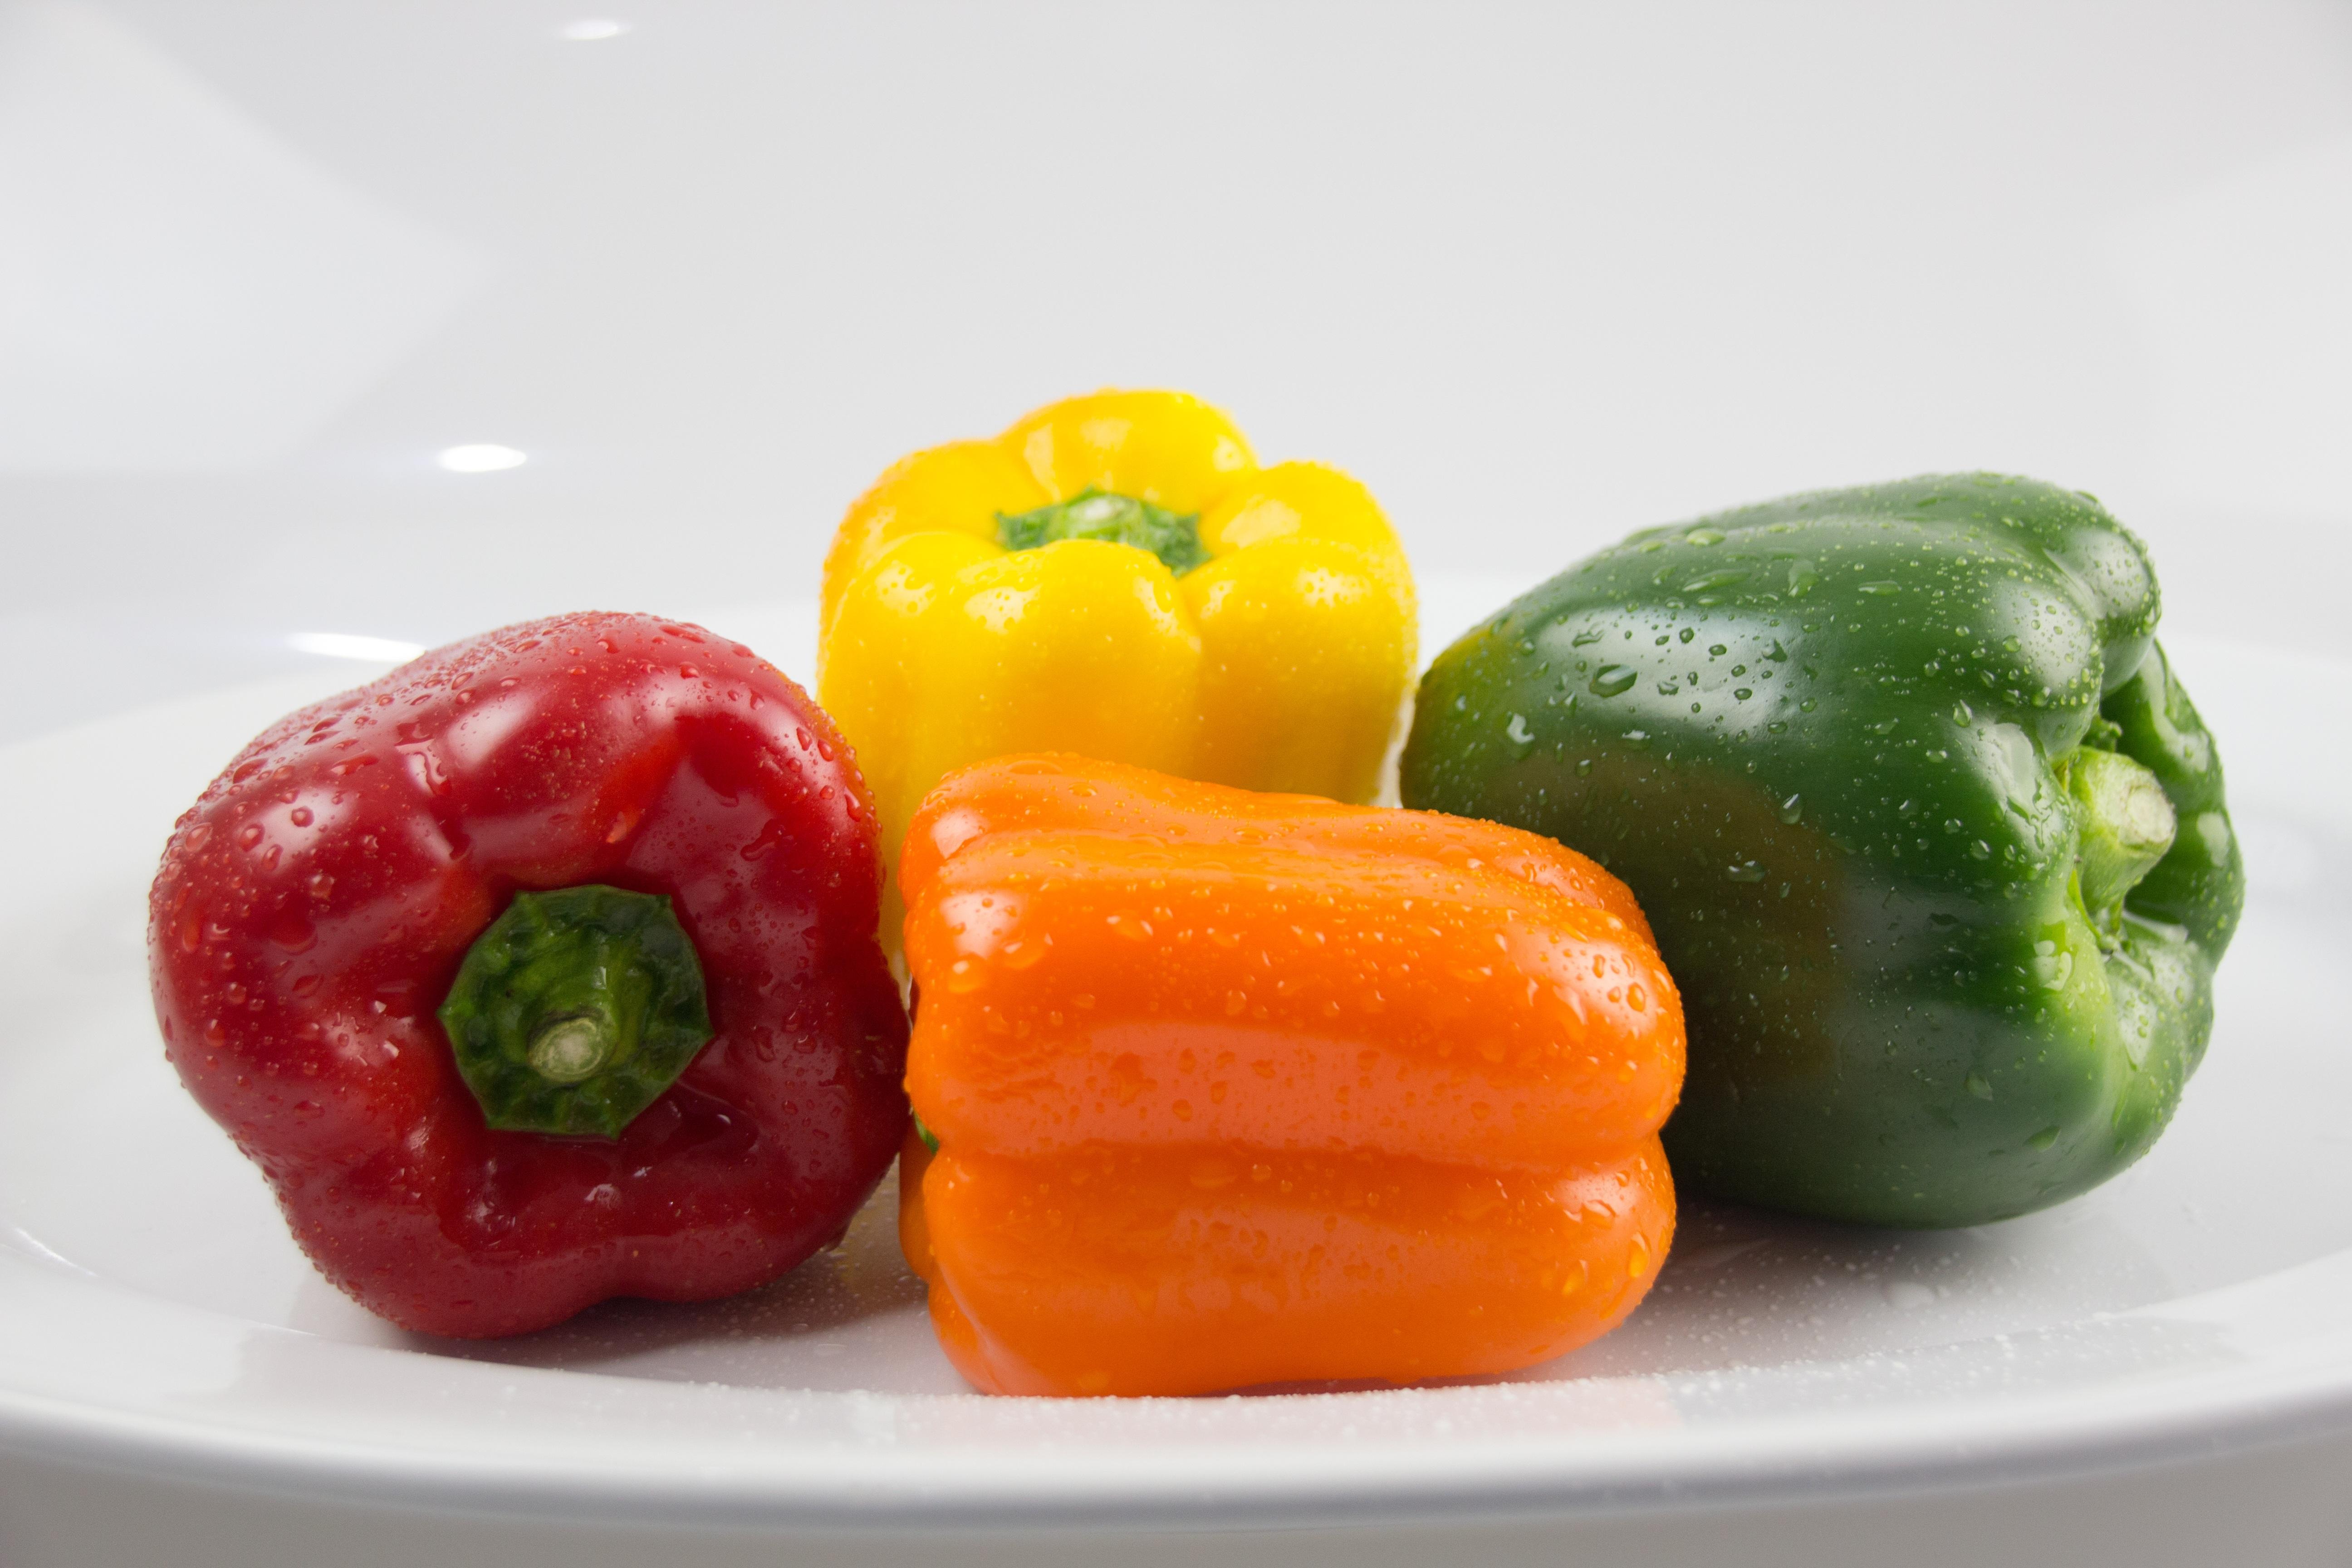 Fotos gratis : restaurante, comida, Produce, vegetal, cocina ...